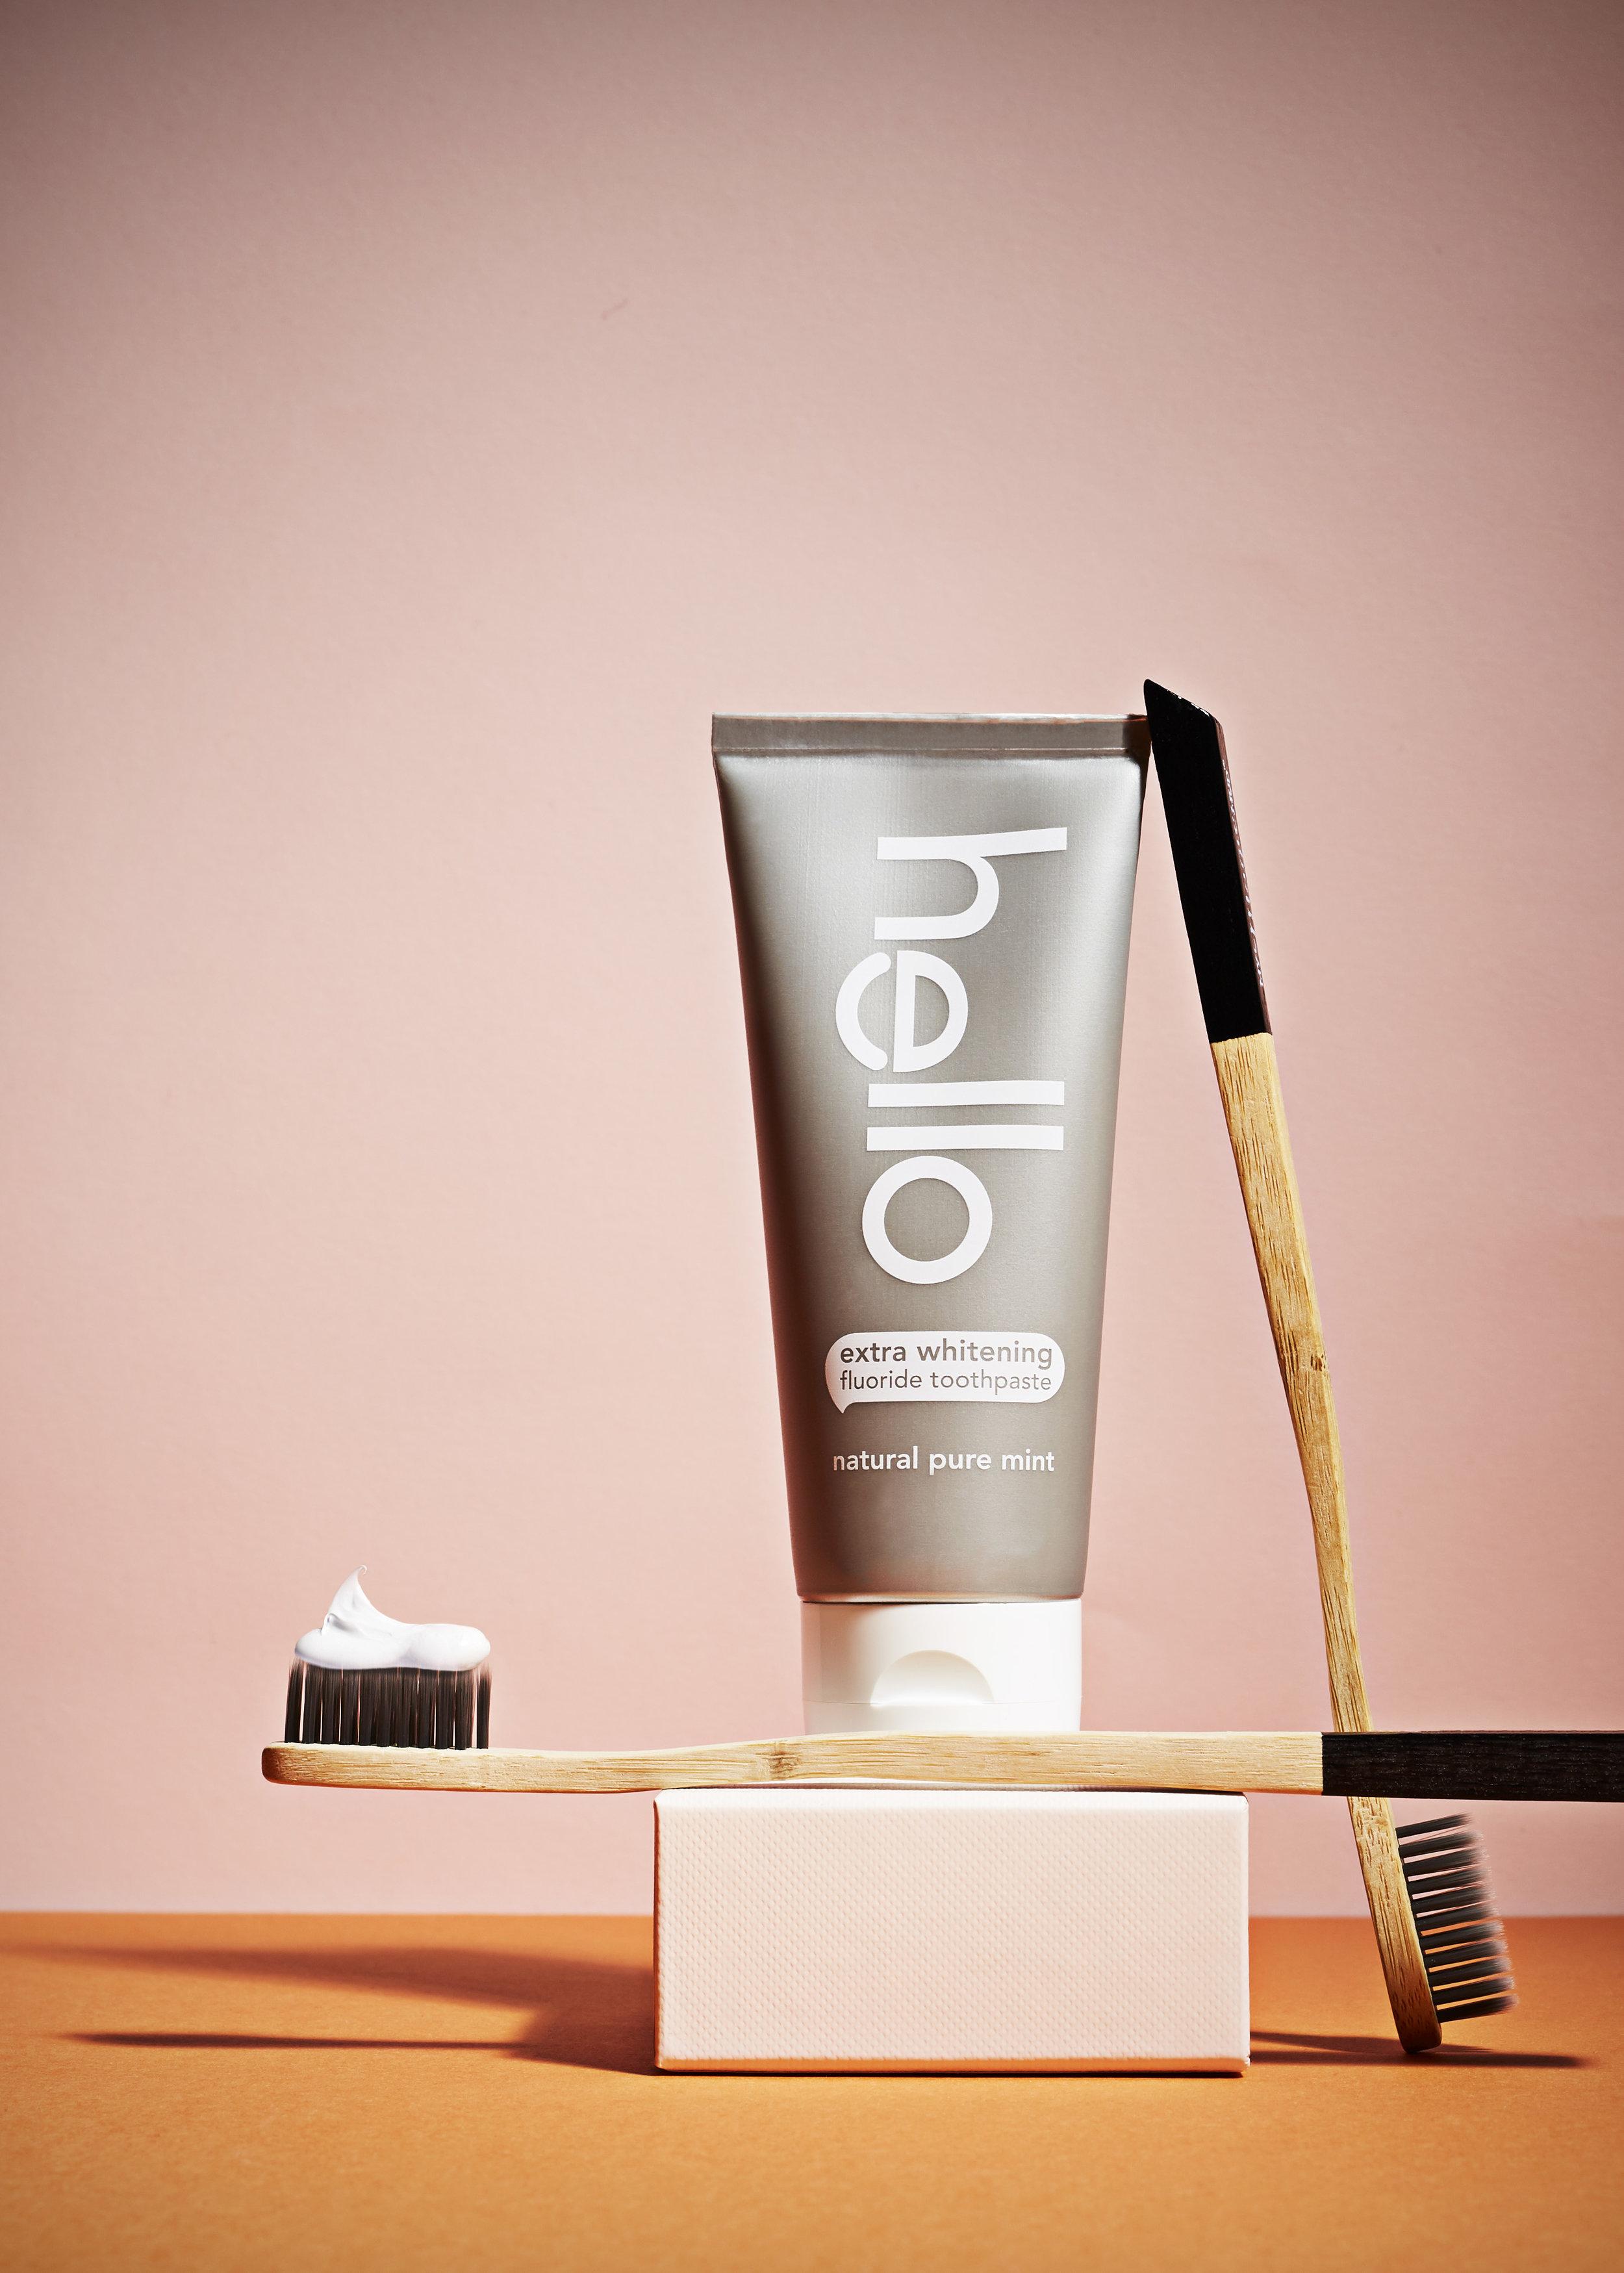 toothpaste_Mickie_Clark-sethiversonphoto_2_5849 1.jpg